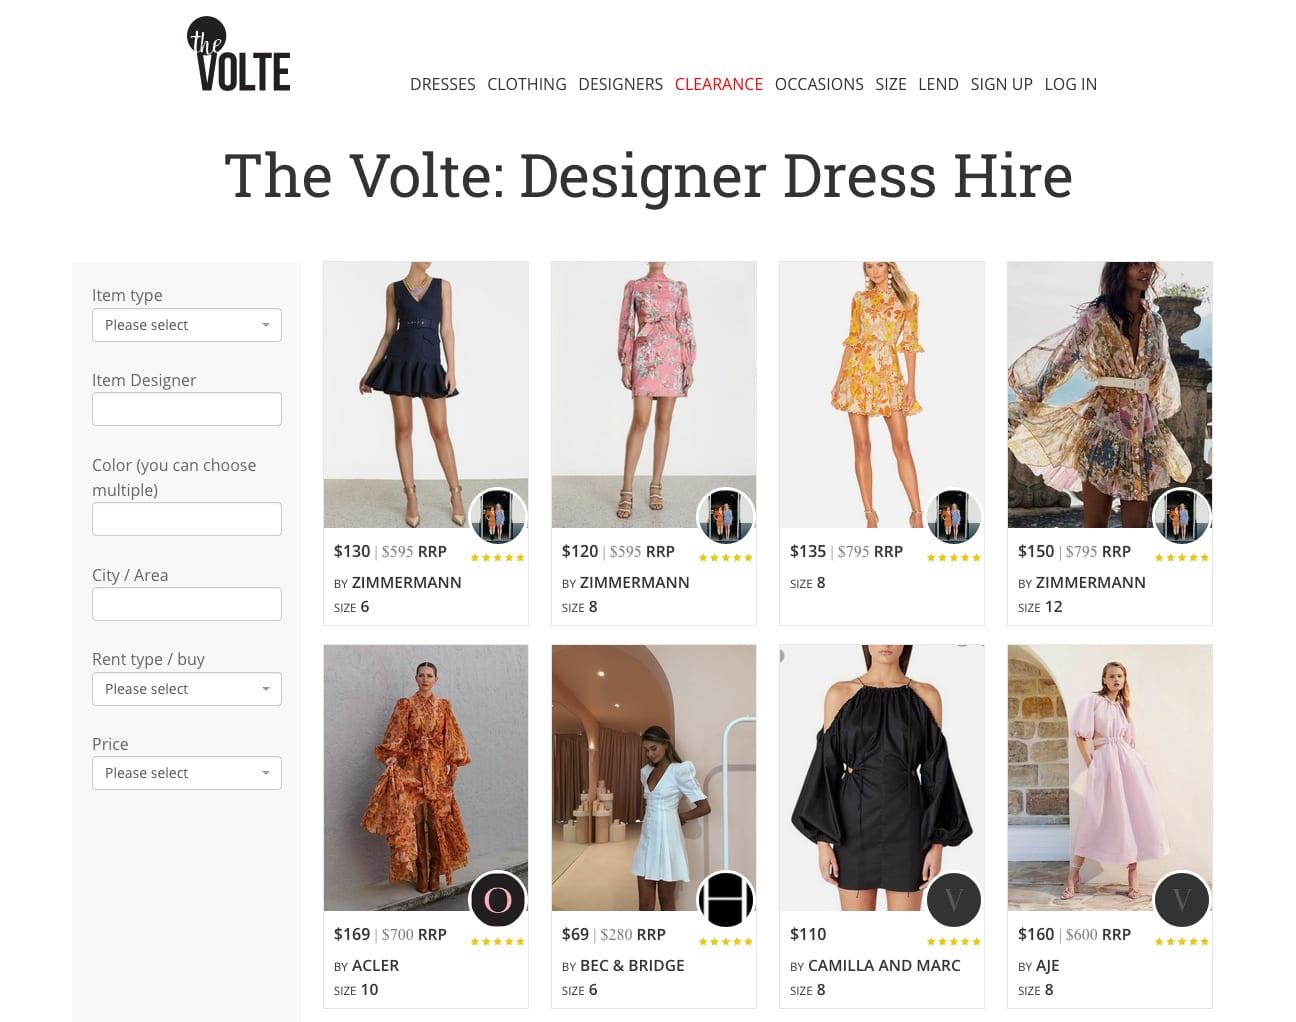 The Volte